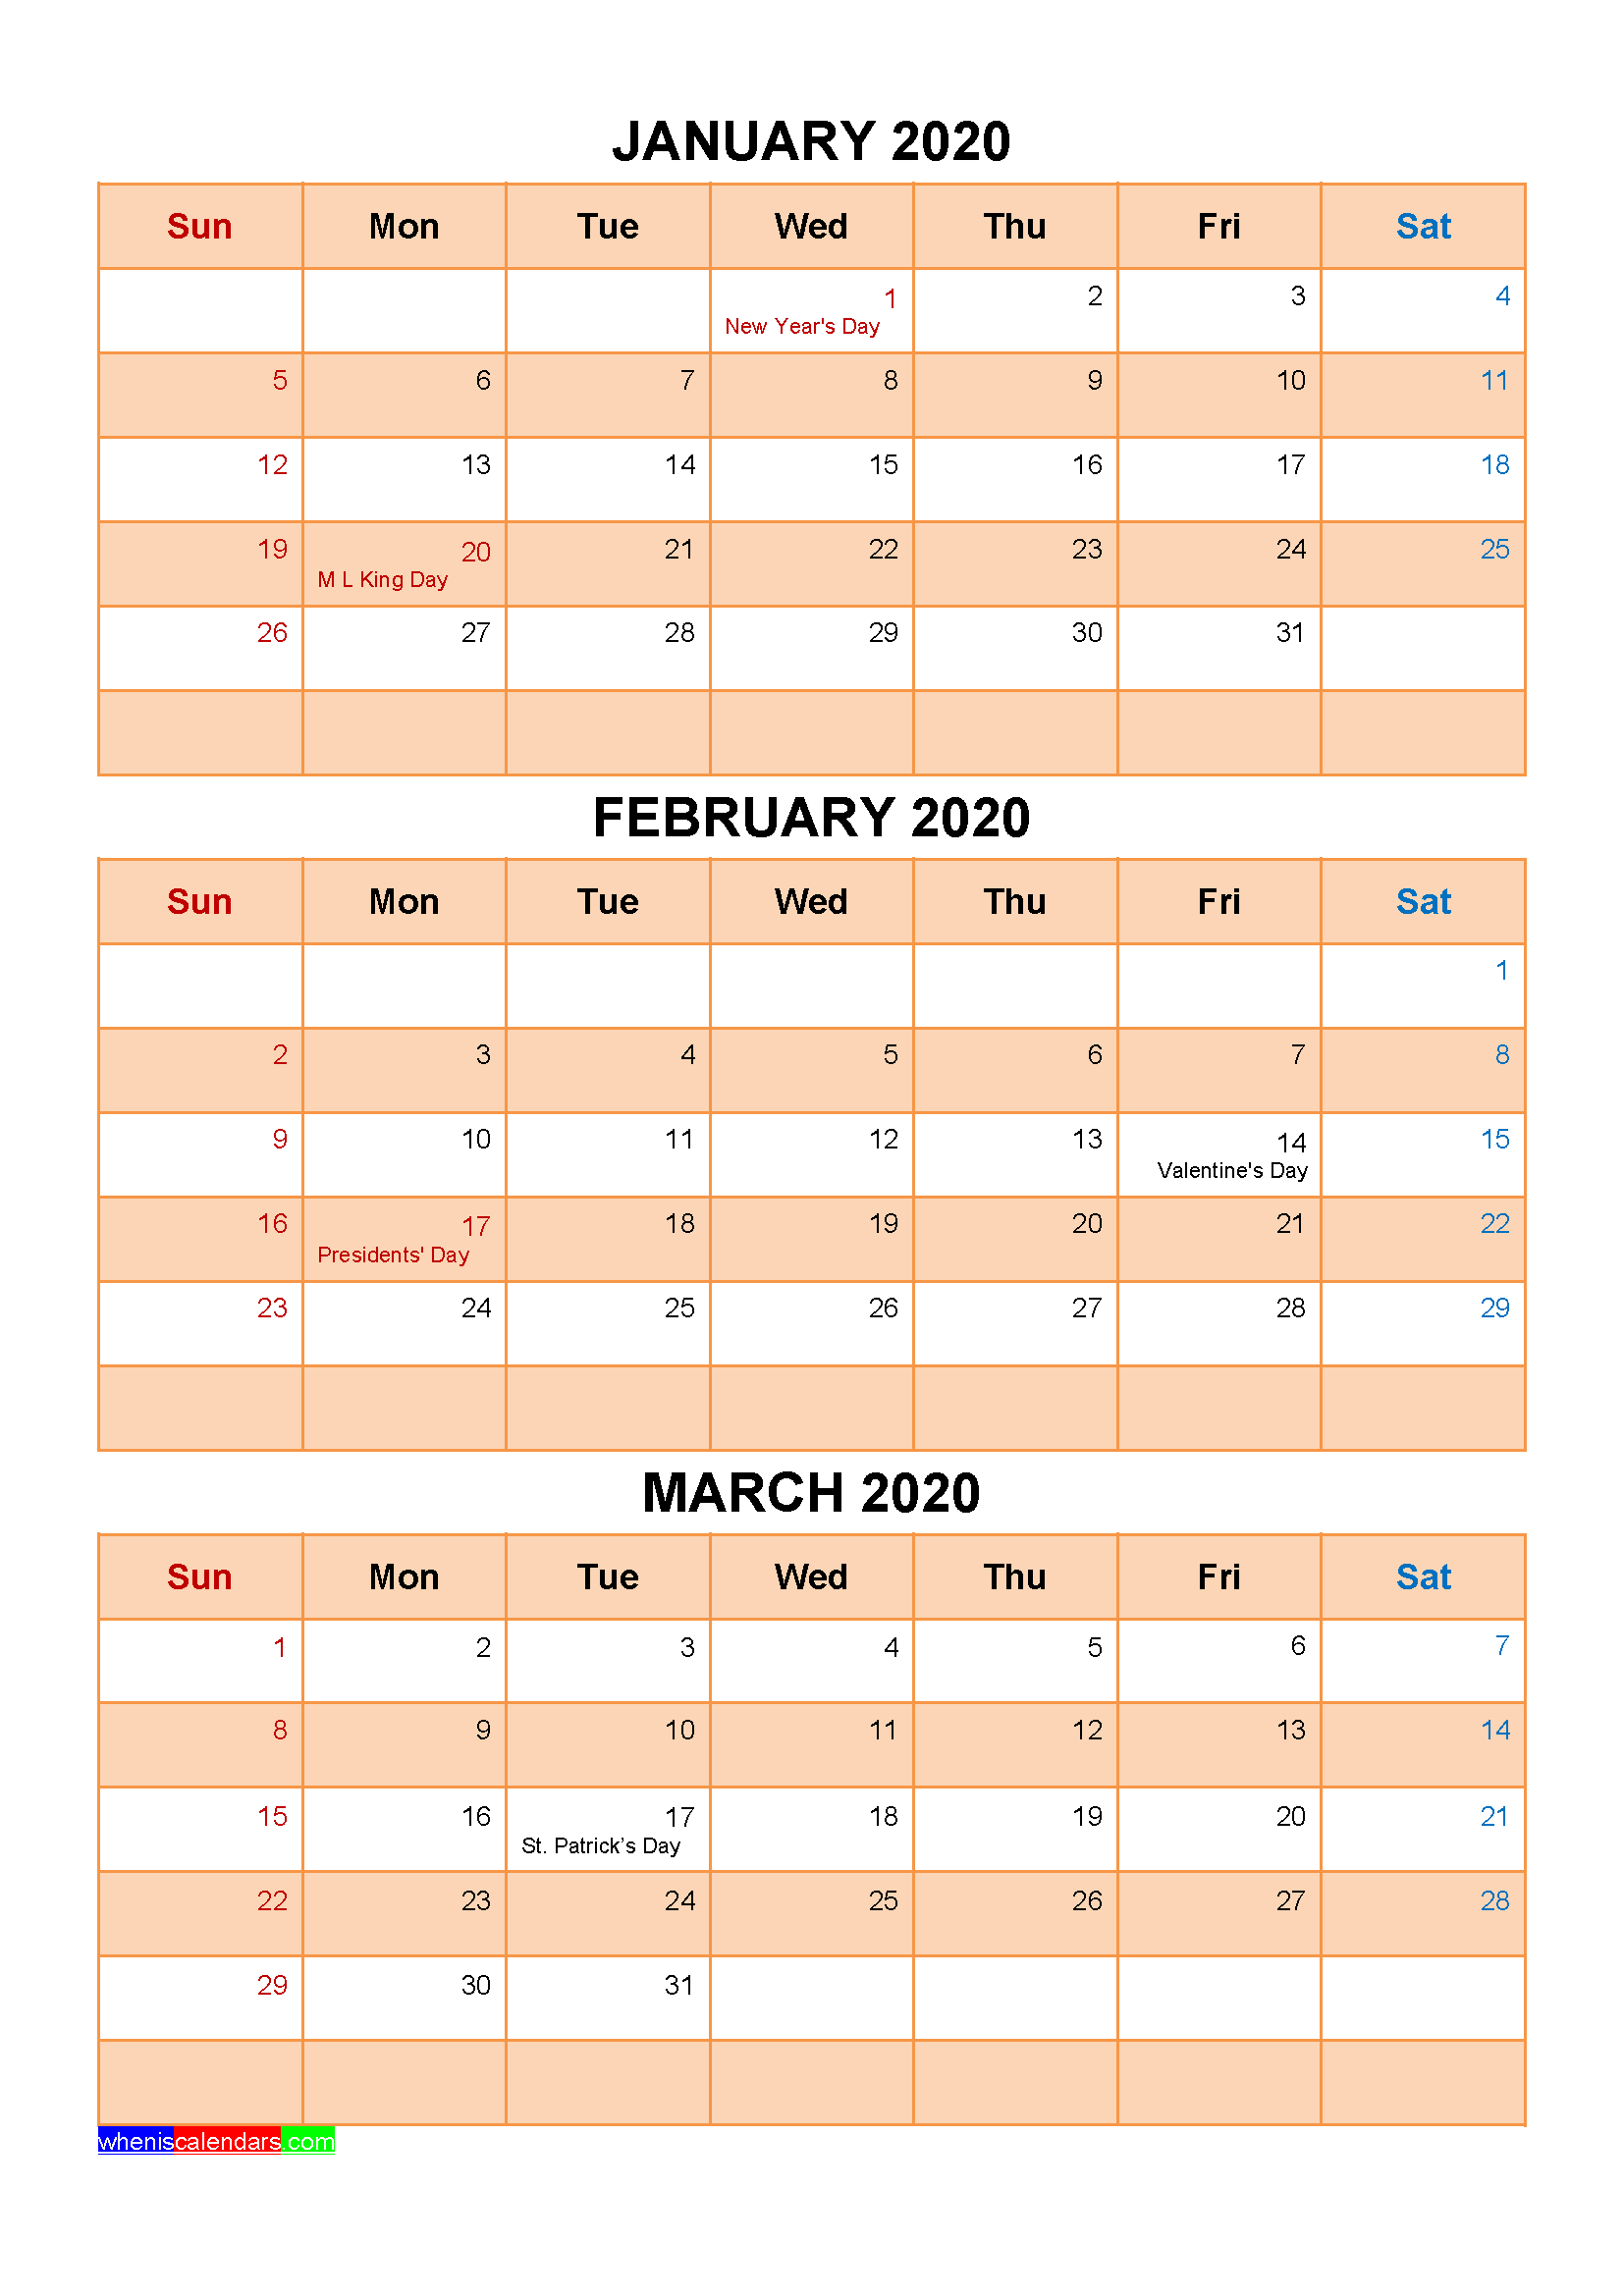 Printable January February March 2020 Calendar with Holidays